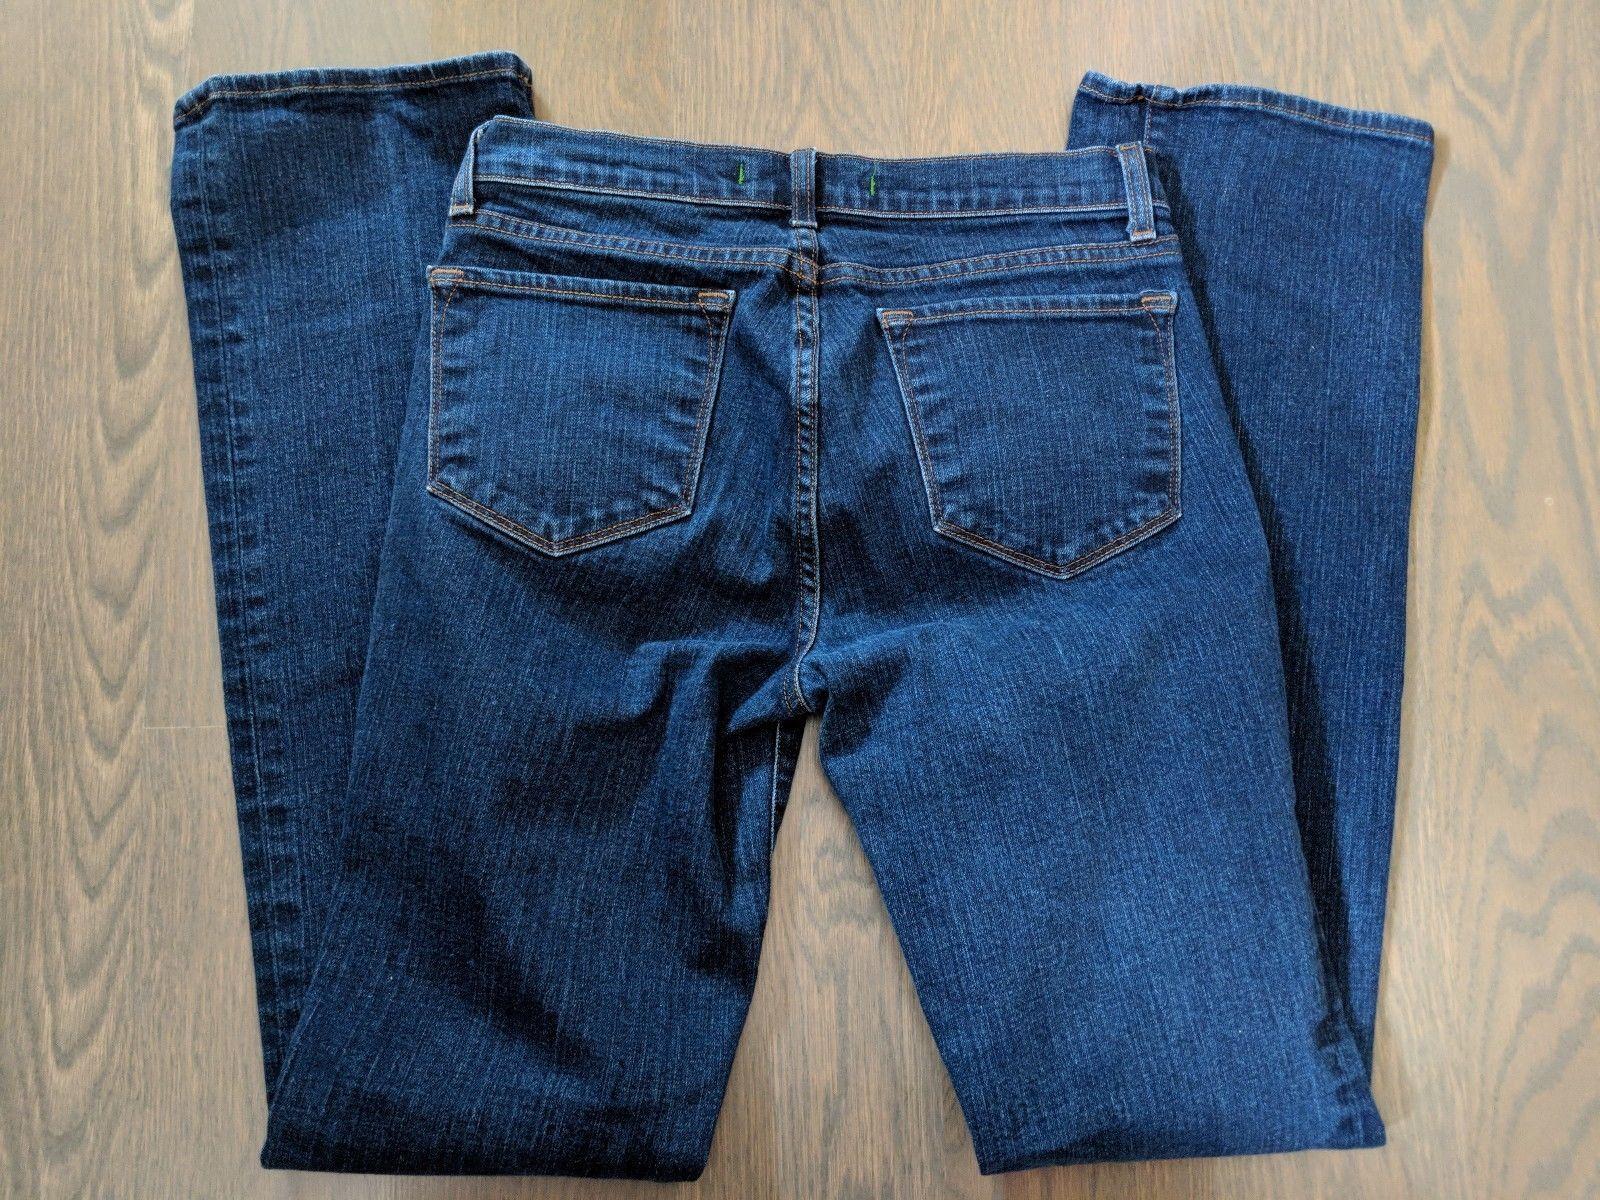 J Brand 28 Aruba Denim Skinny Slim Stretch Medium Wash Jeans Womens Pants image 9